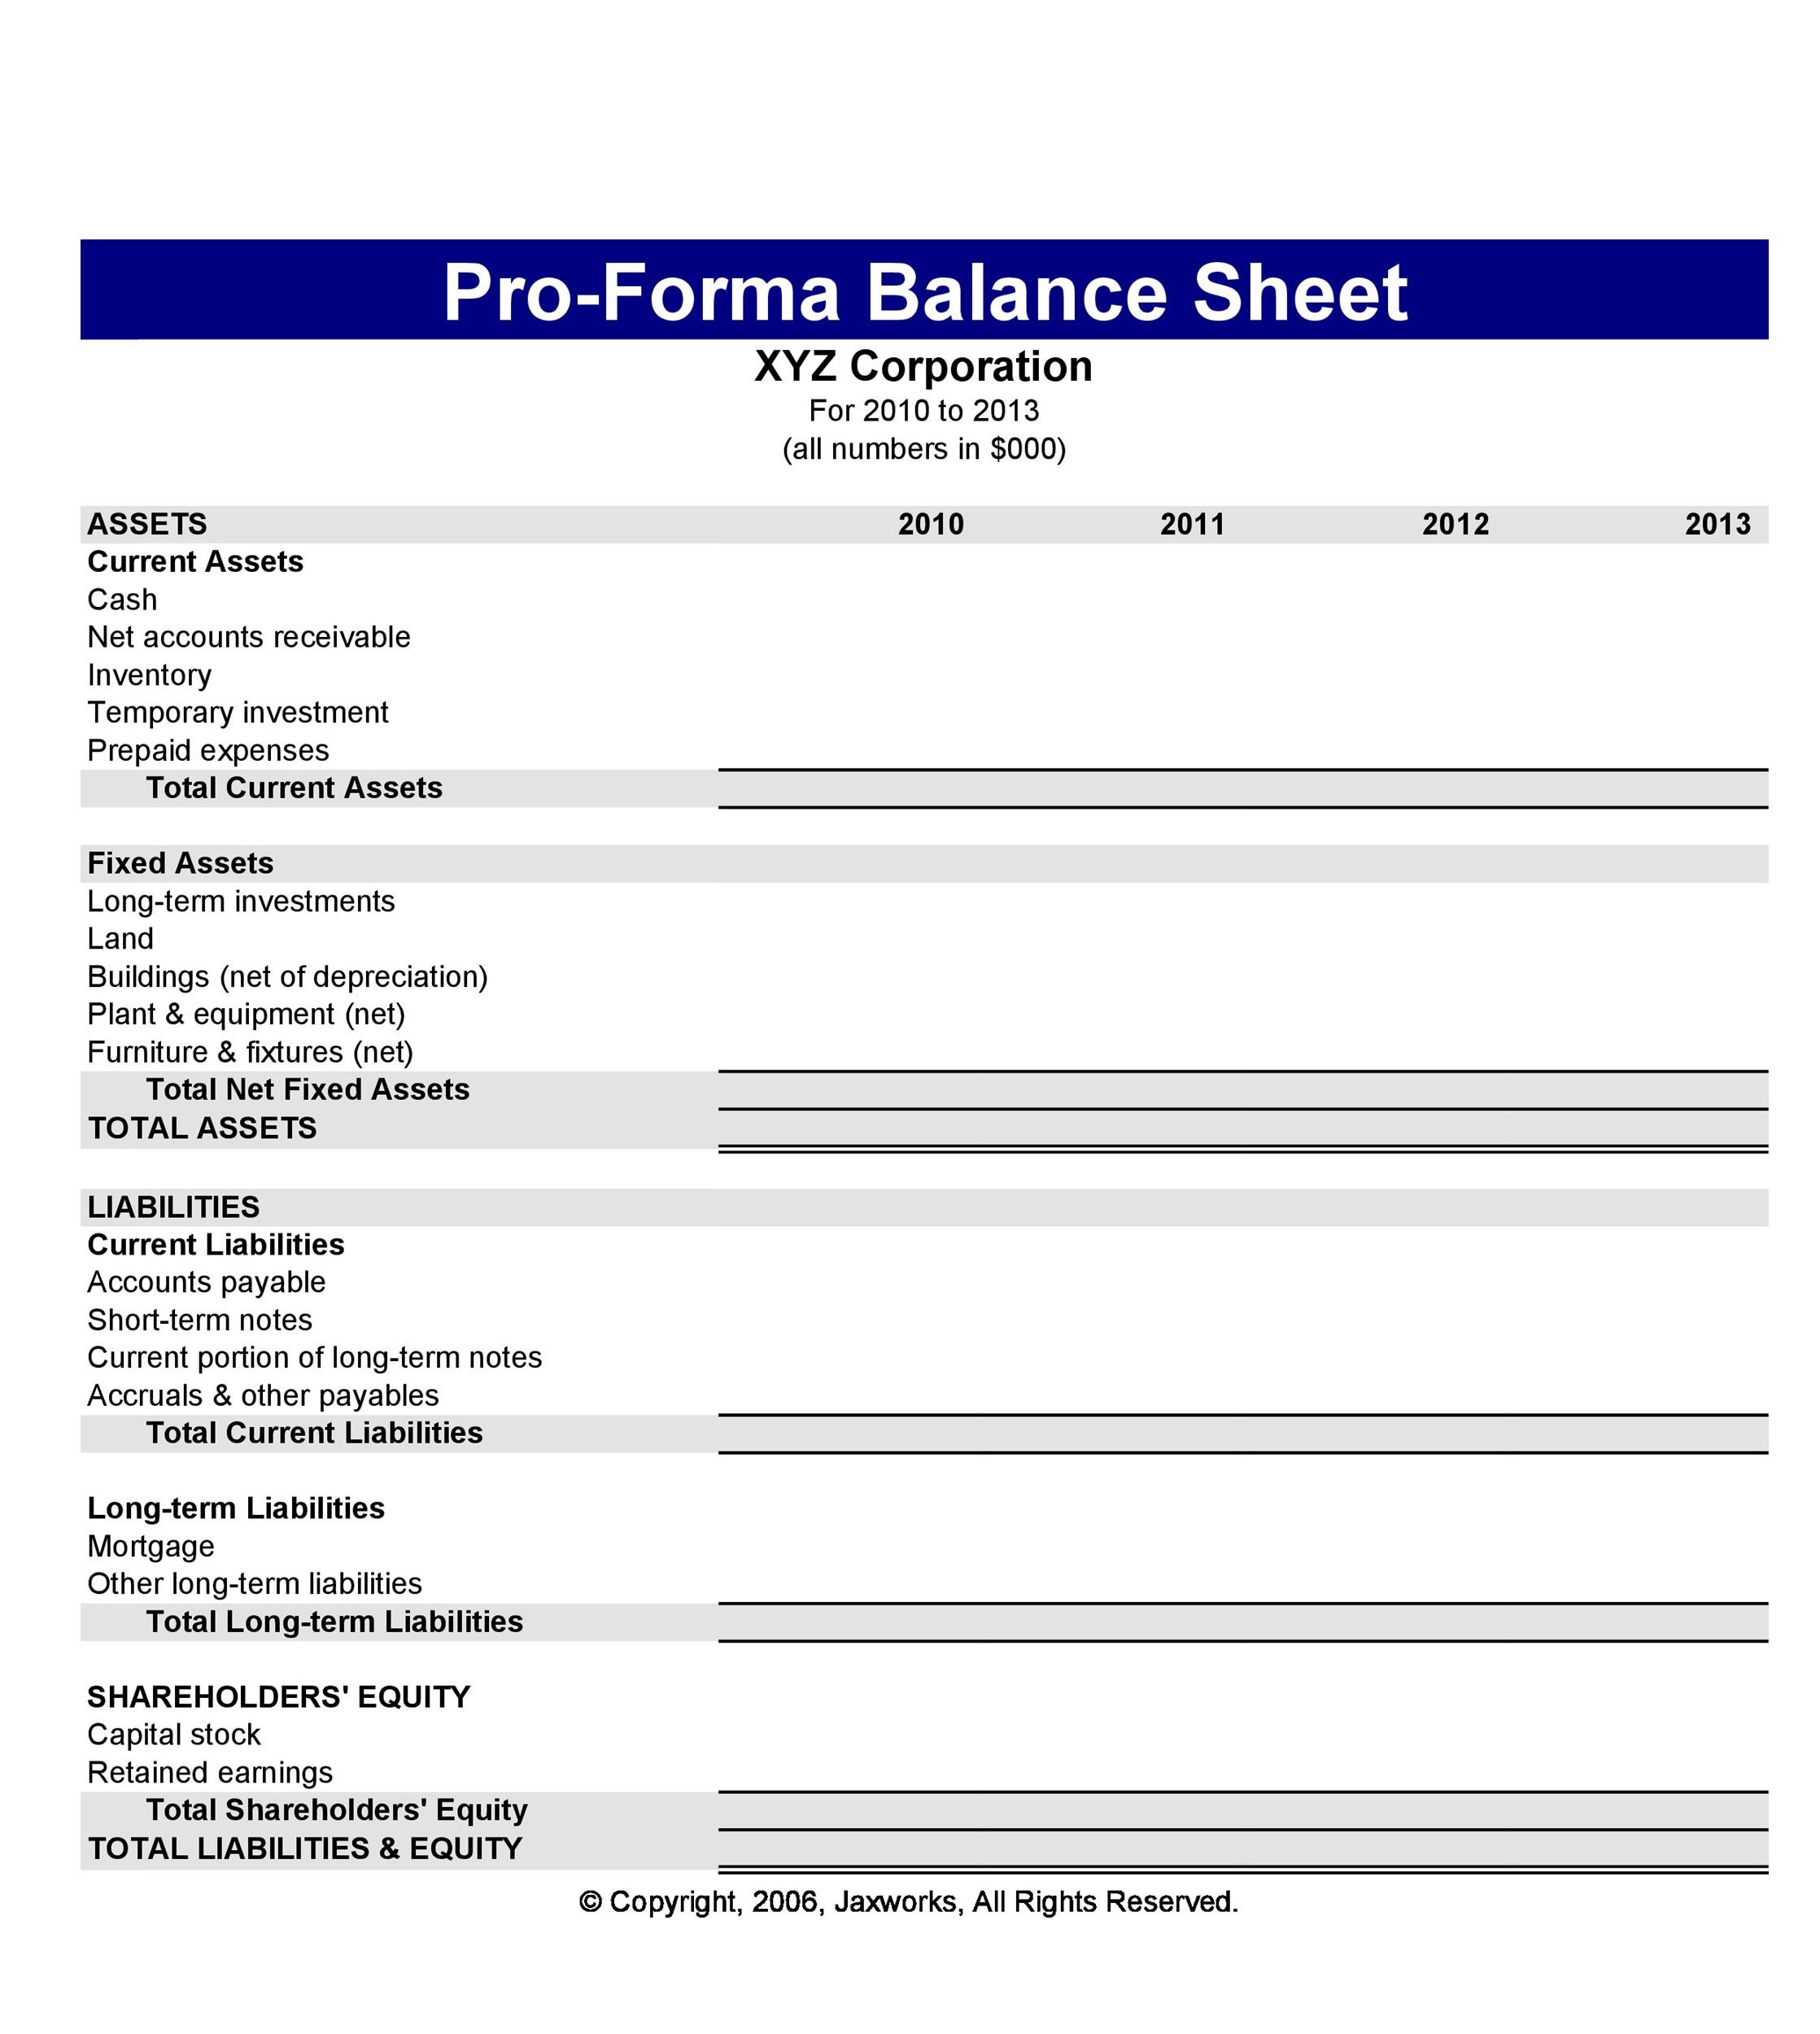 38 Free Balance Sheet Templates & Examples ᐅ TemplateLab